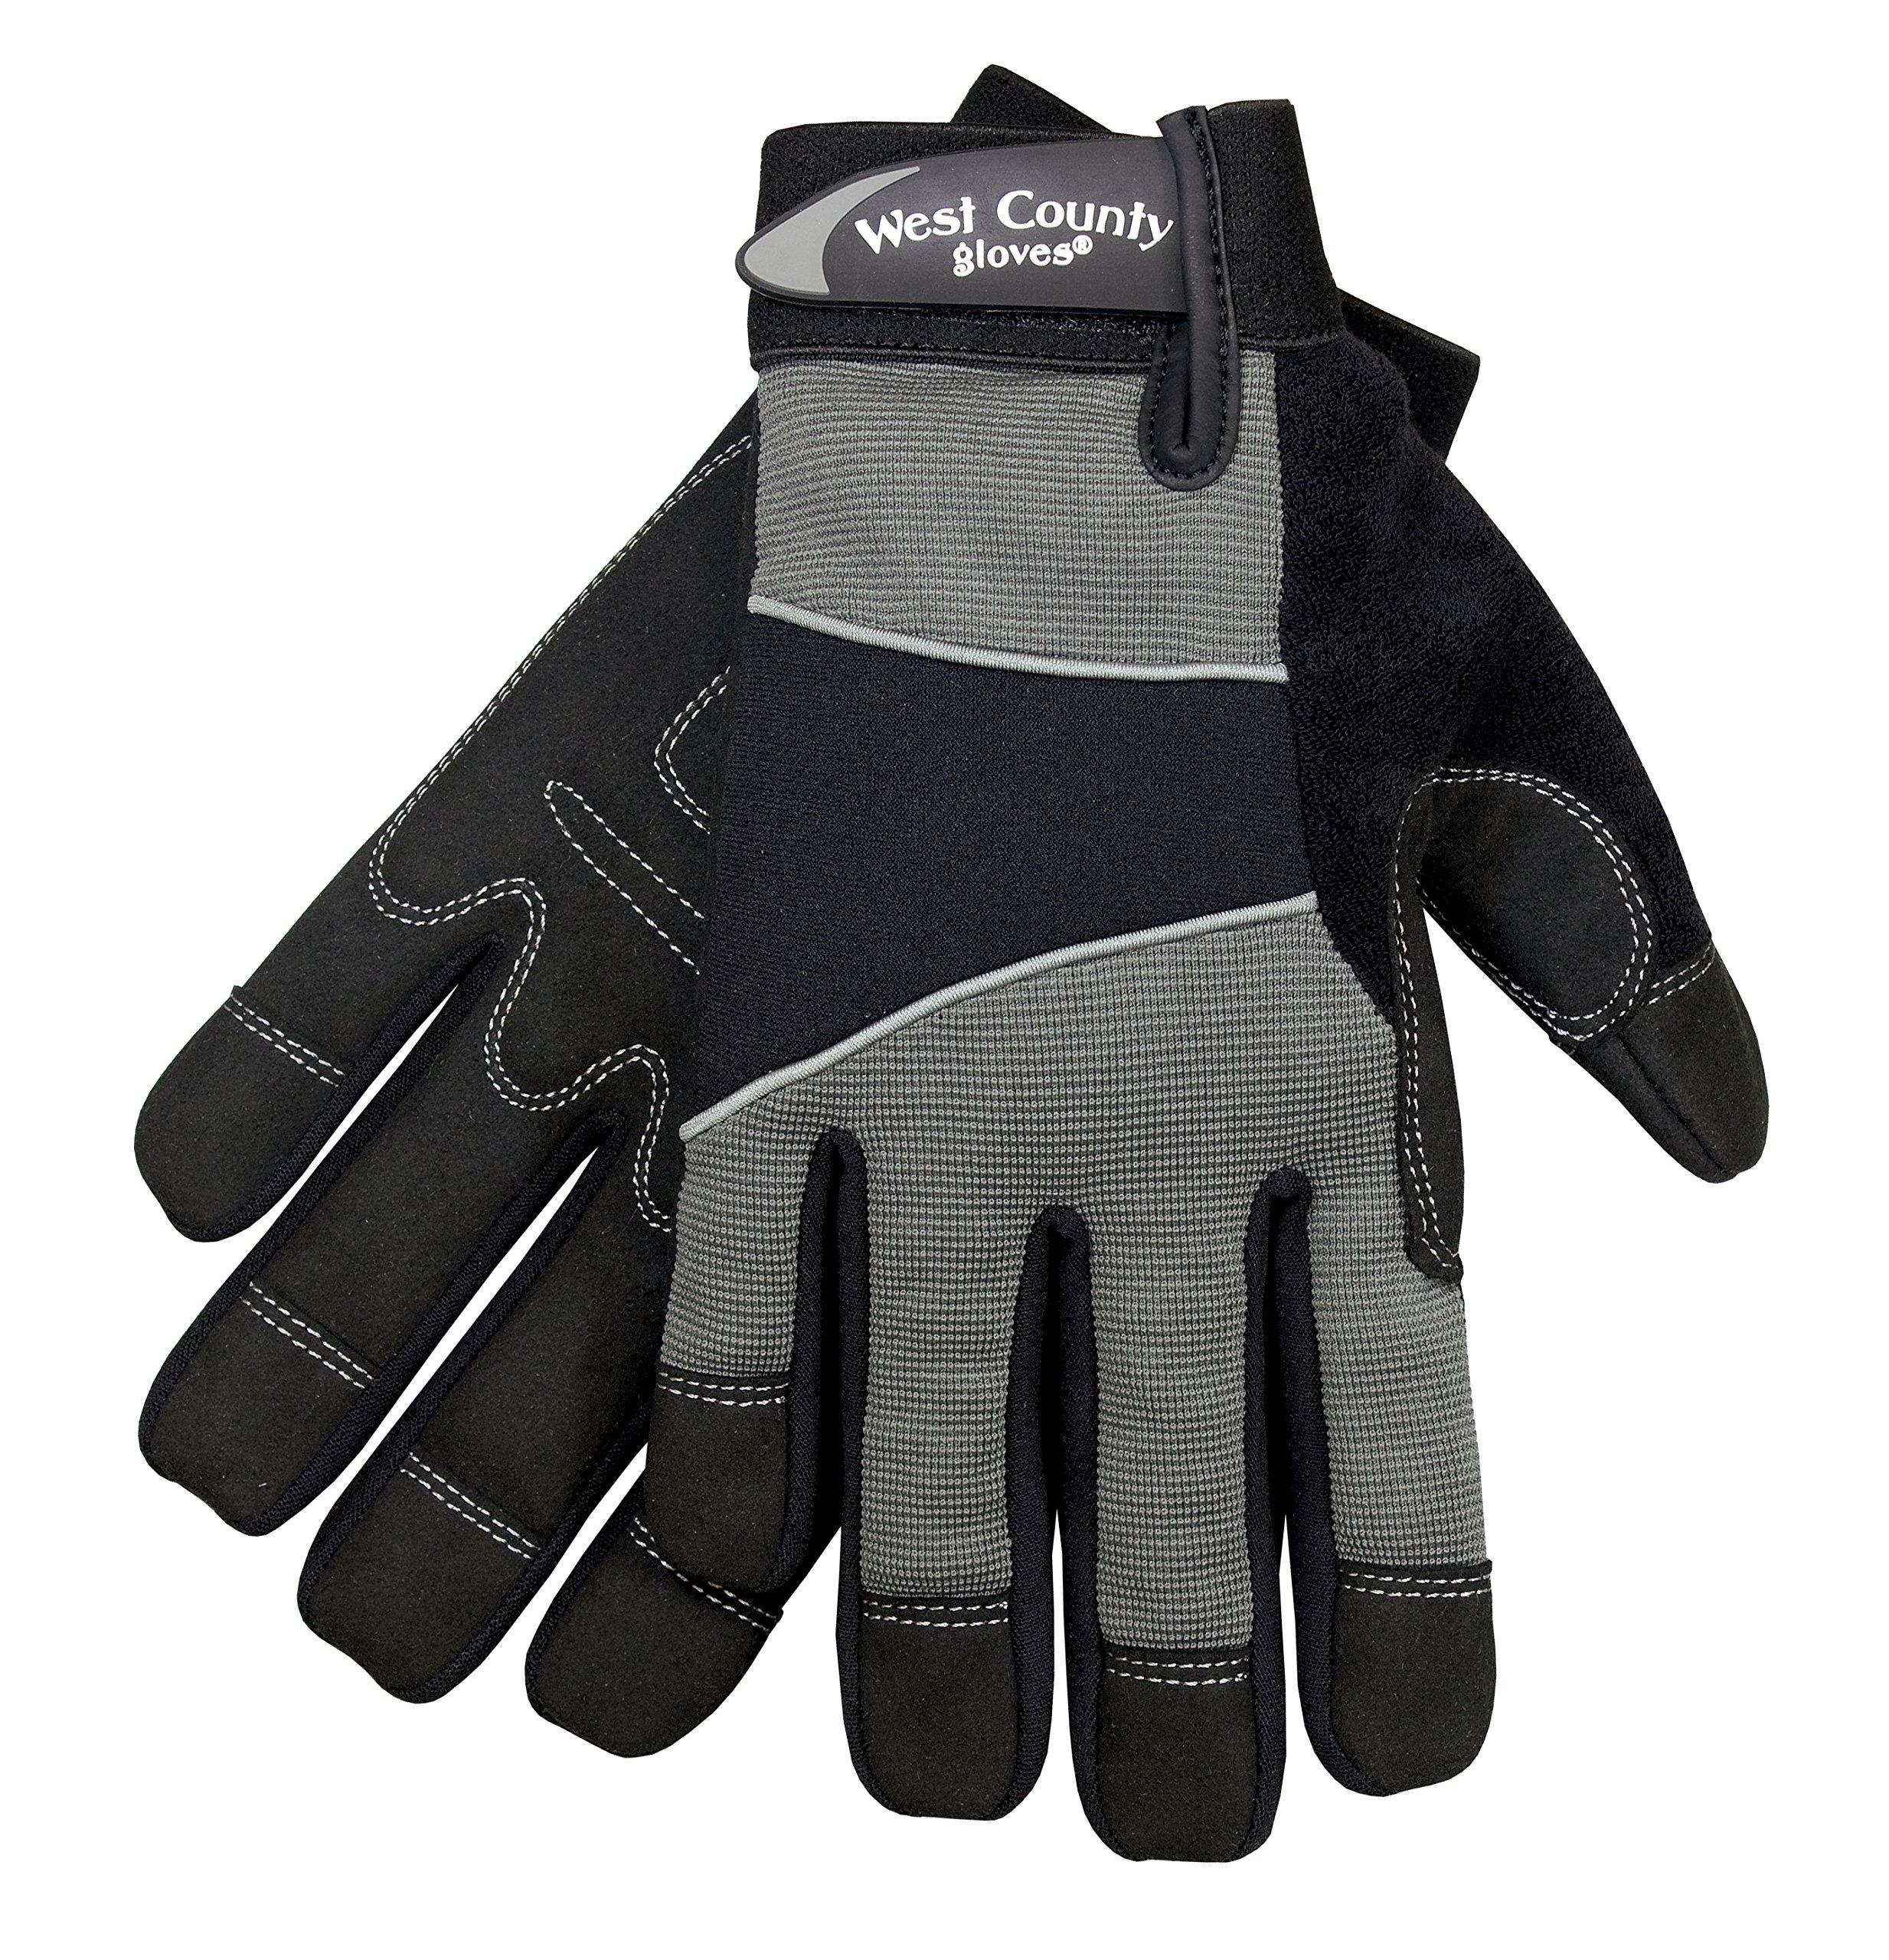 West County Gardener 013C/XXL Men's Work Glove, XX-Large, Charcoal